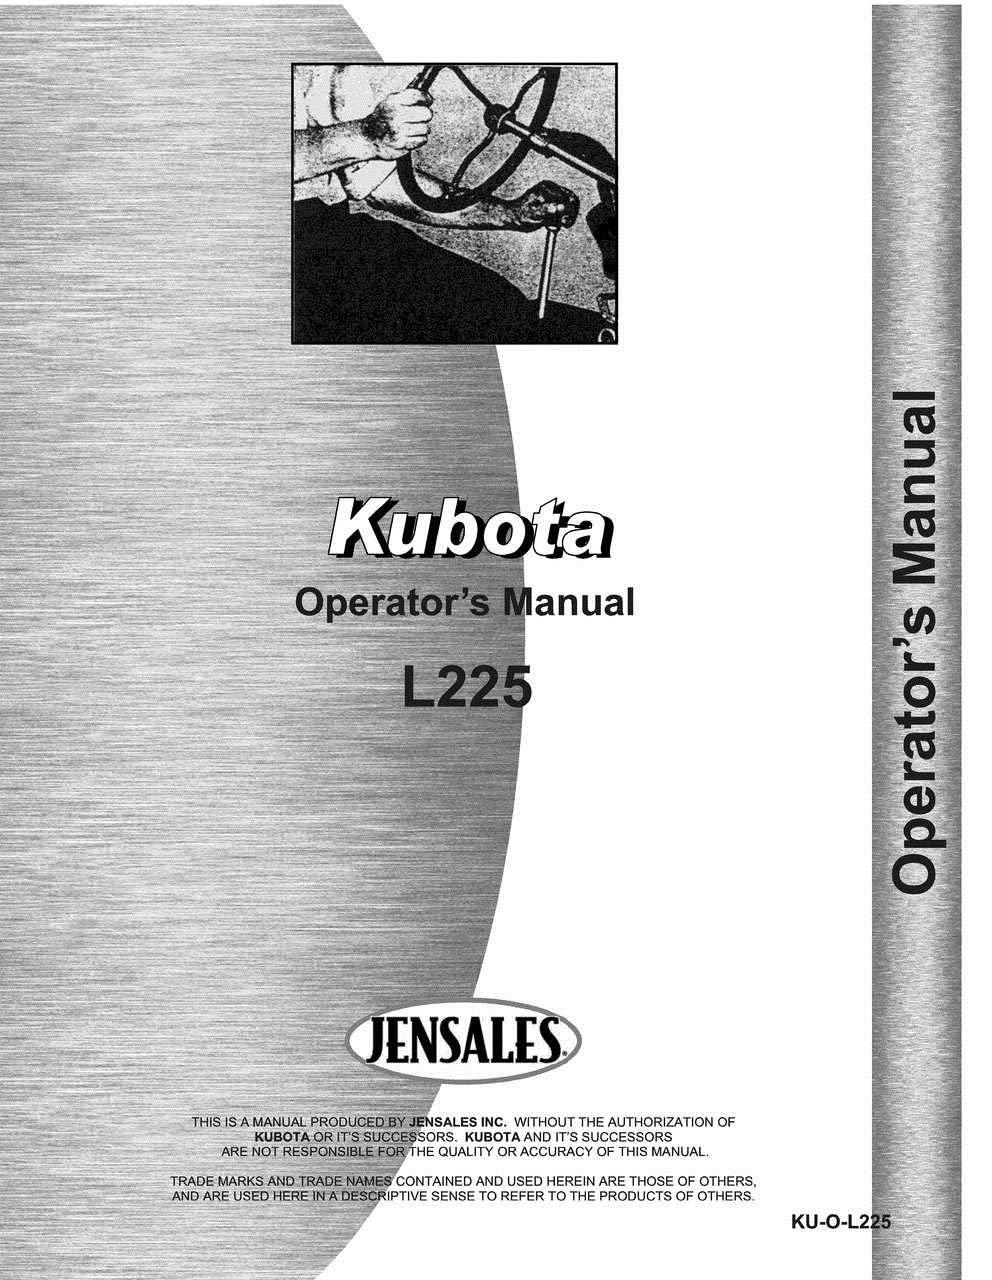 Kubota L225 Tractor Operators Manual by Jensales